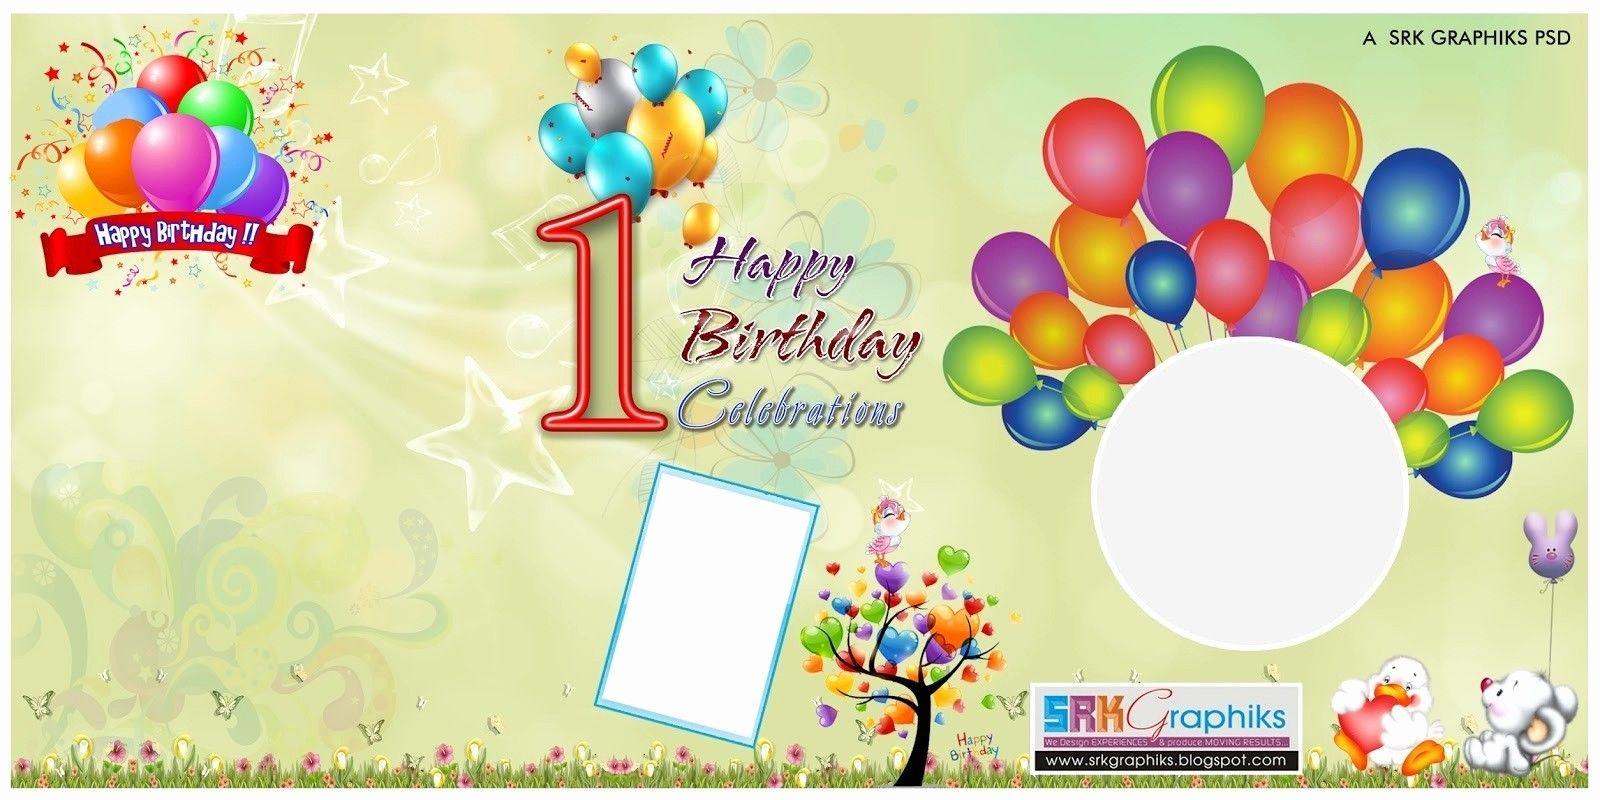 004 Frightening Birthday Card Template Photoshop Sample  Greeting Format 4x6 FreeFull